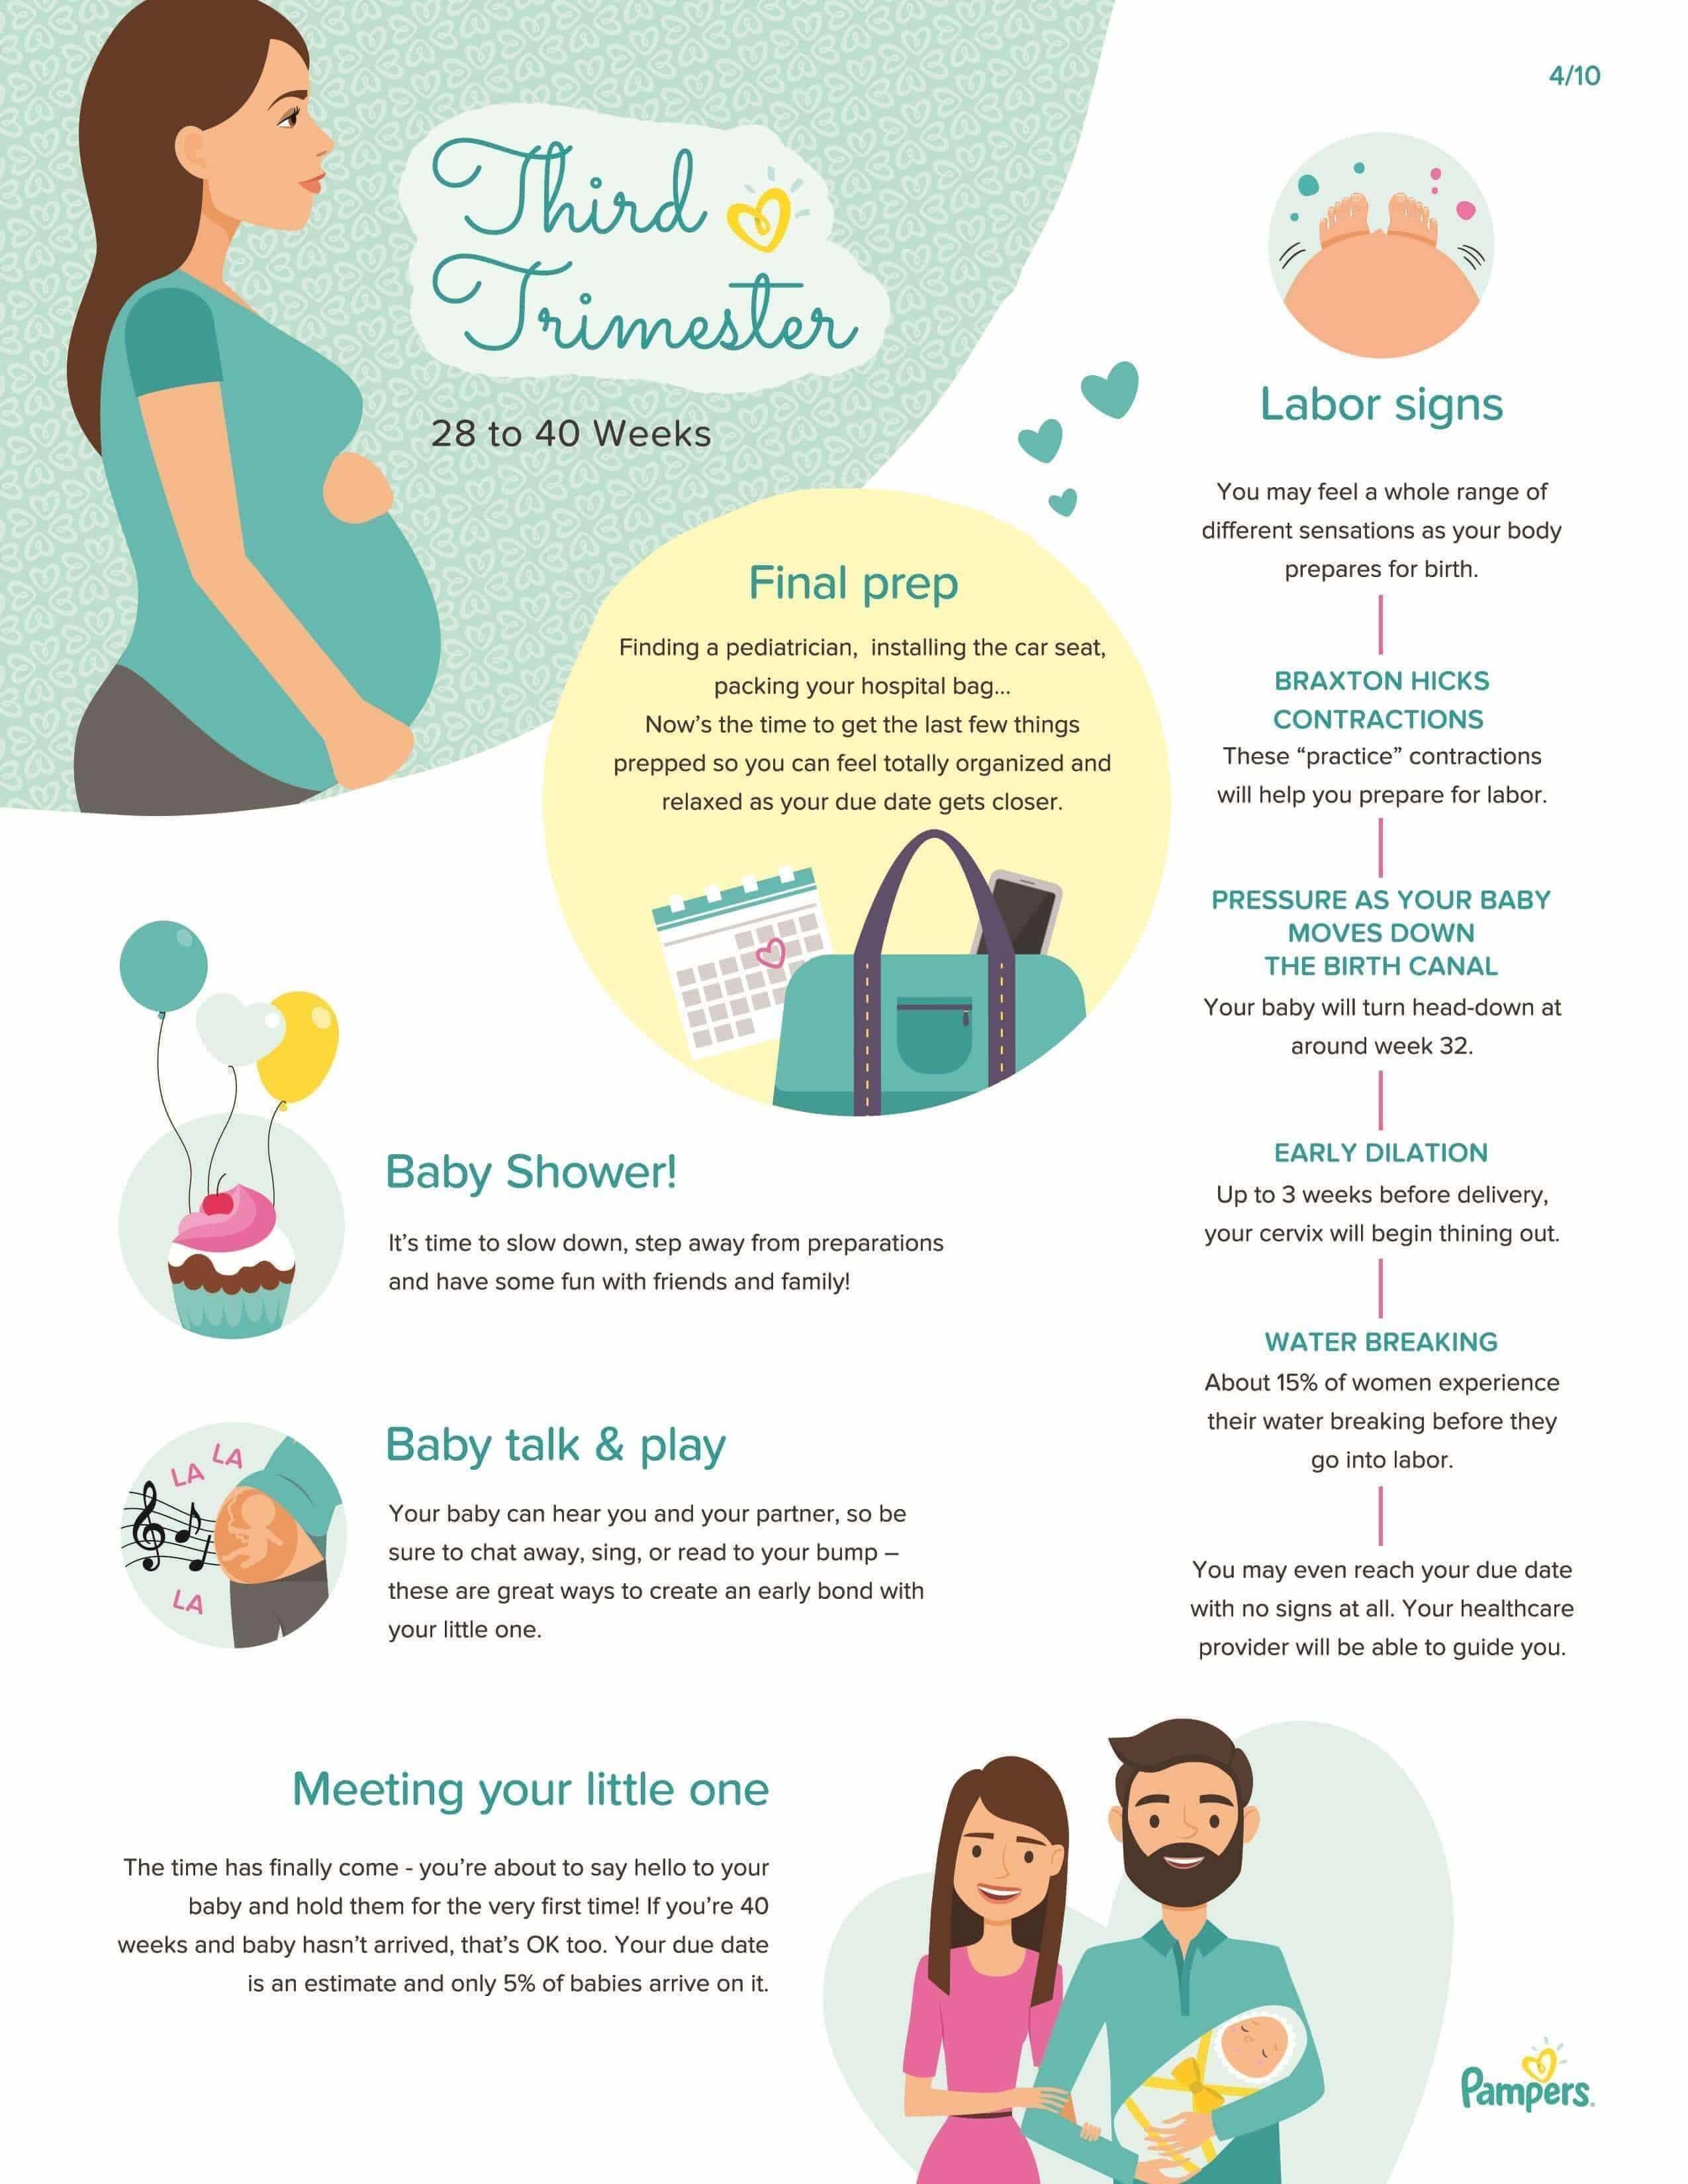 Third Trimester Pregnancy